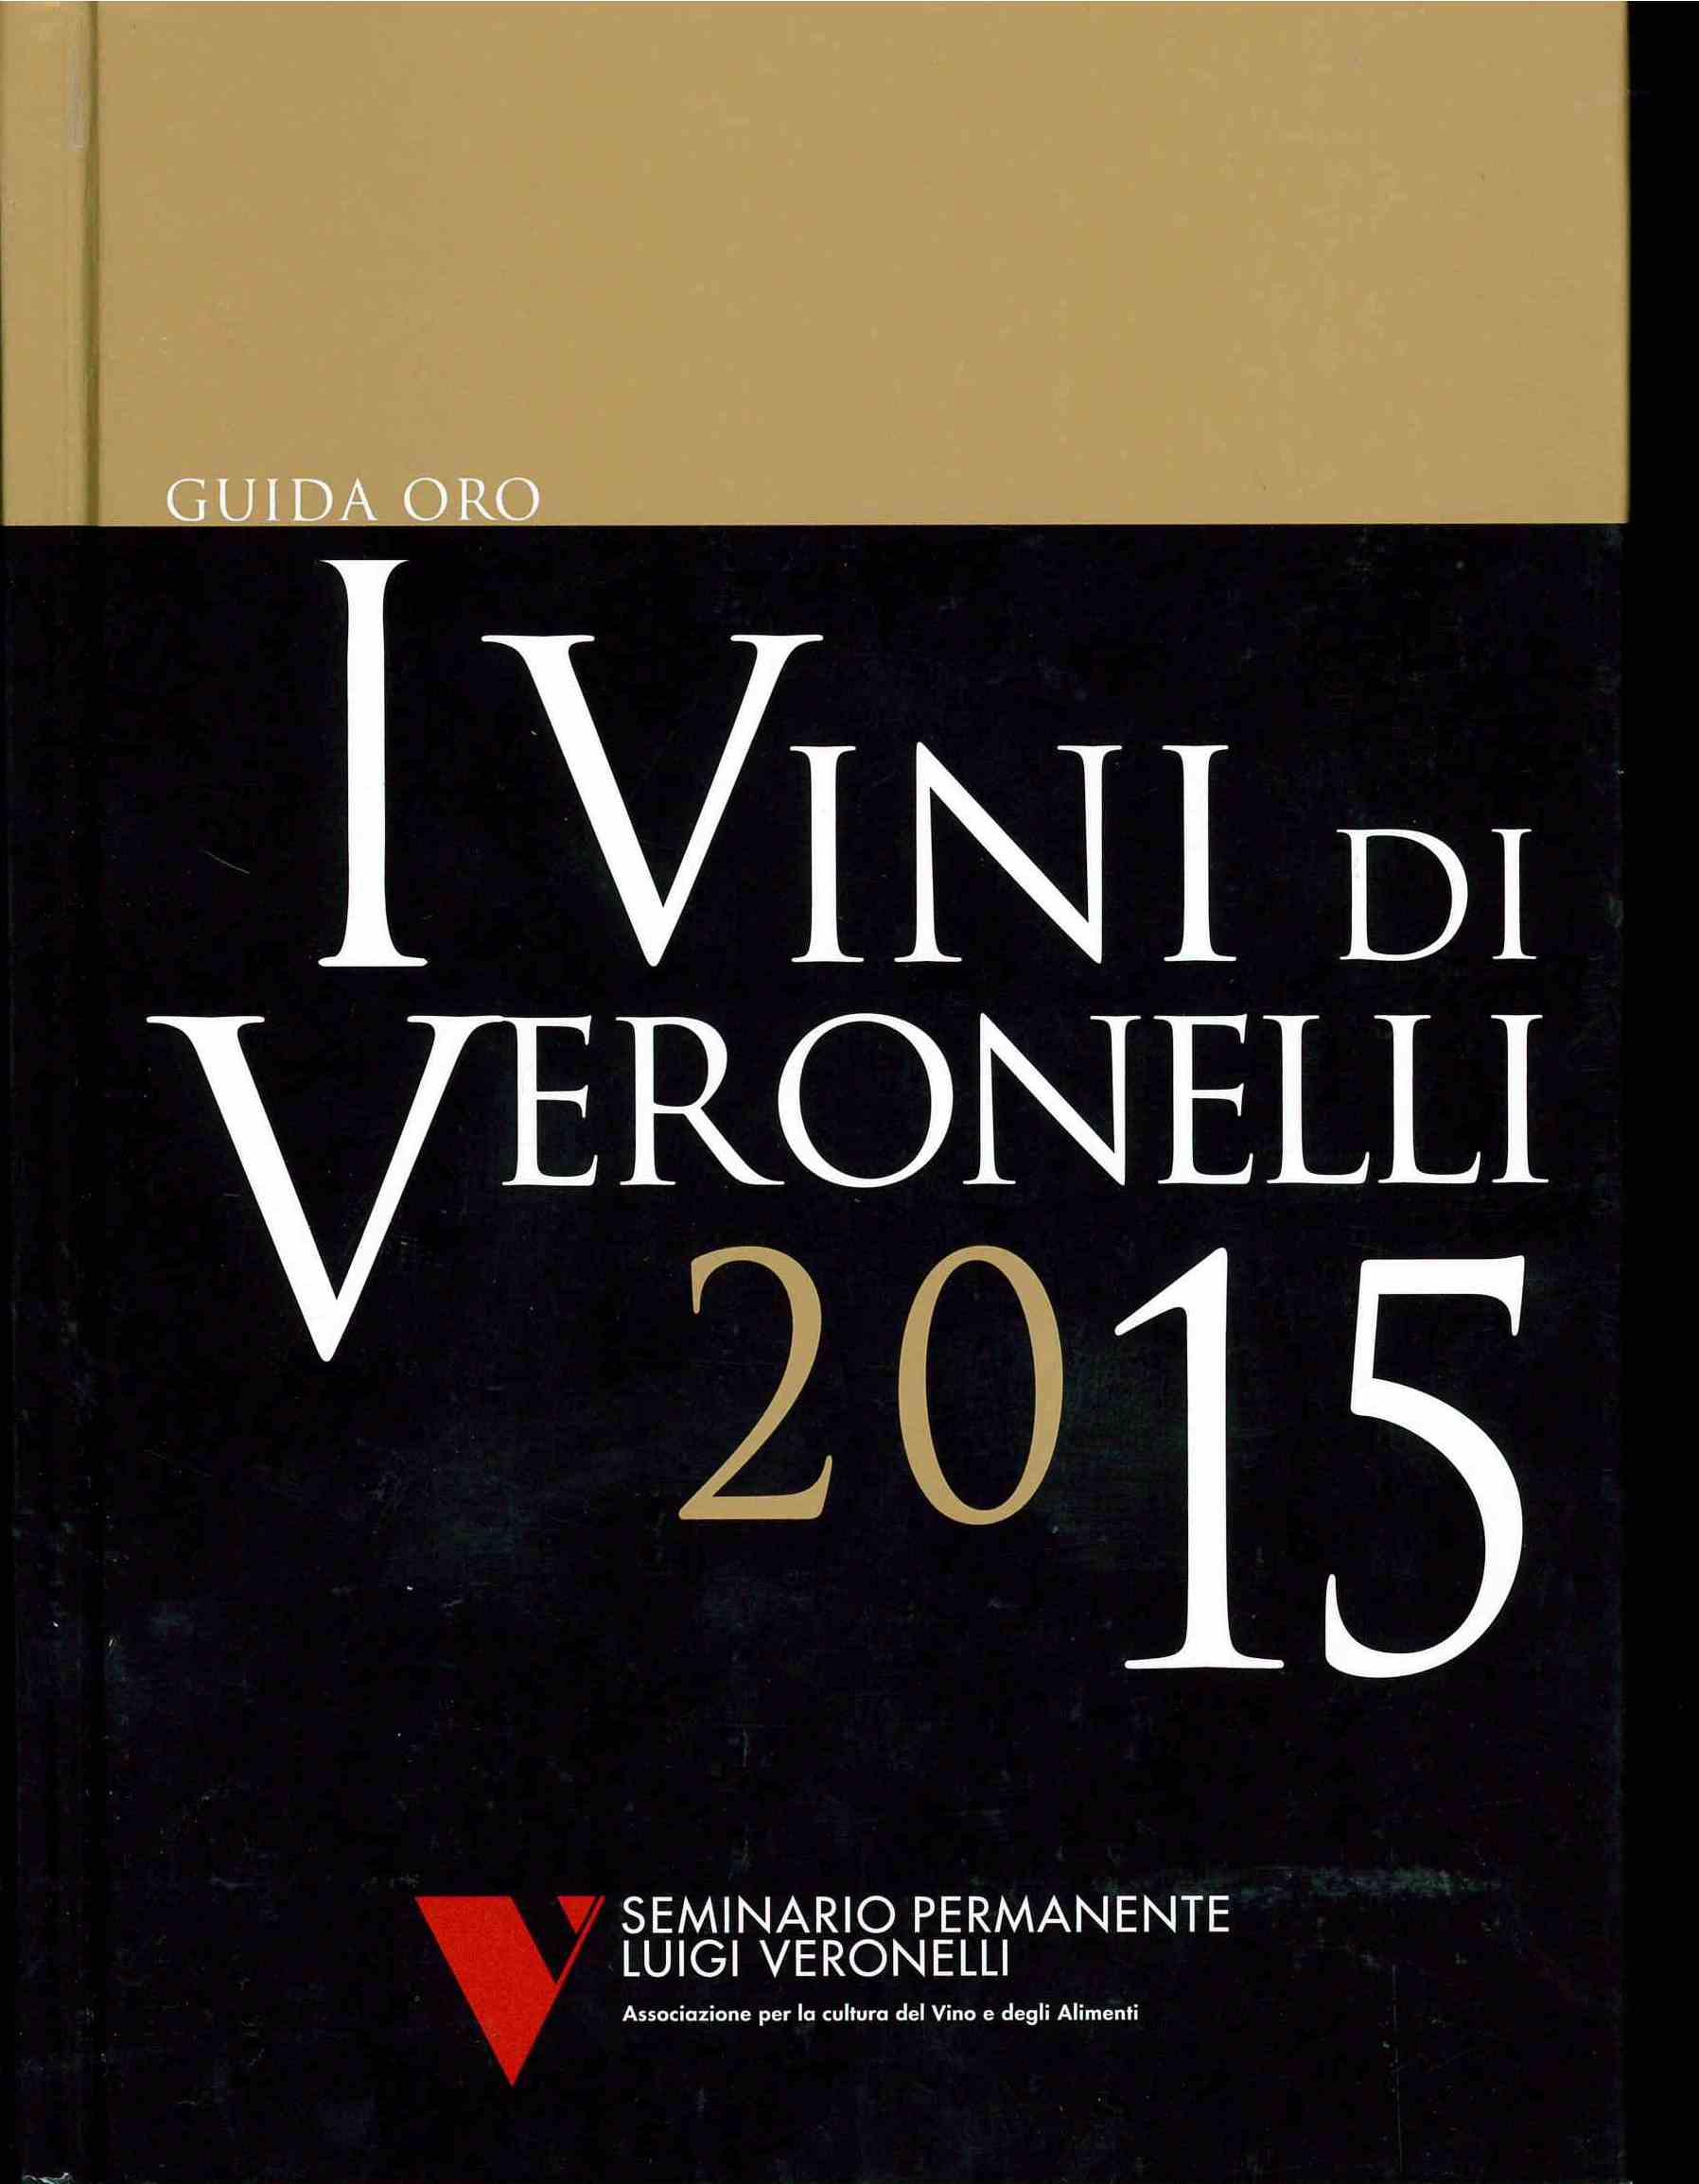 132_veronelli 2015